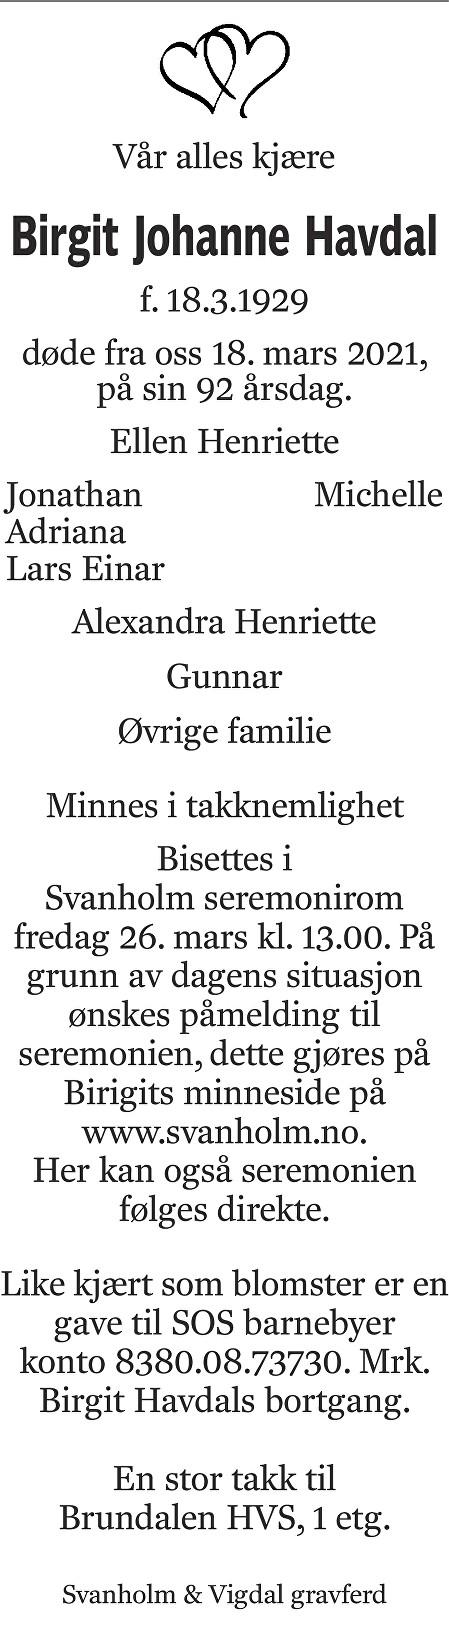 Birgit Johanne Havdal Dødsannonse